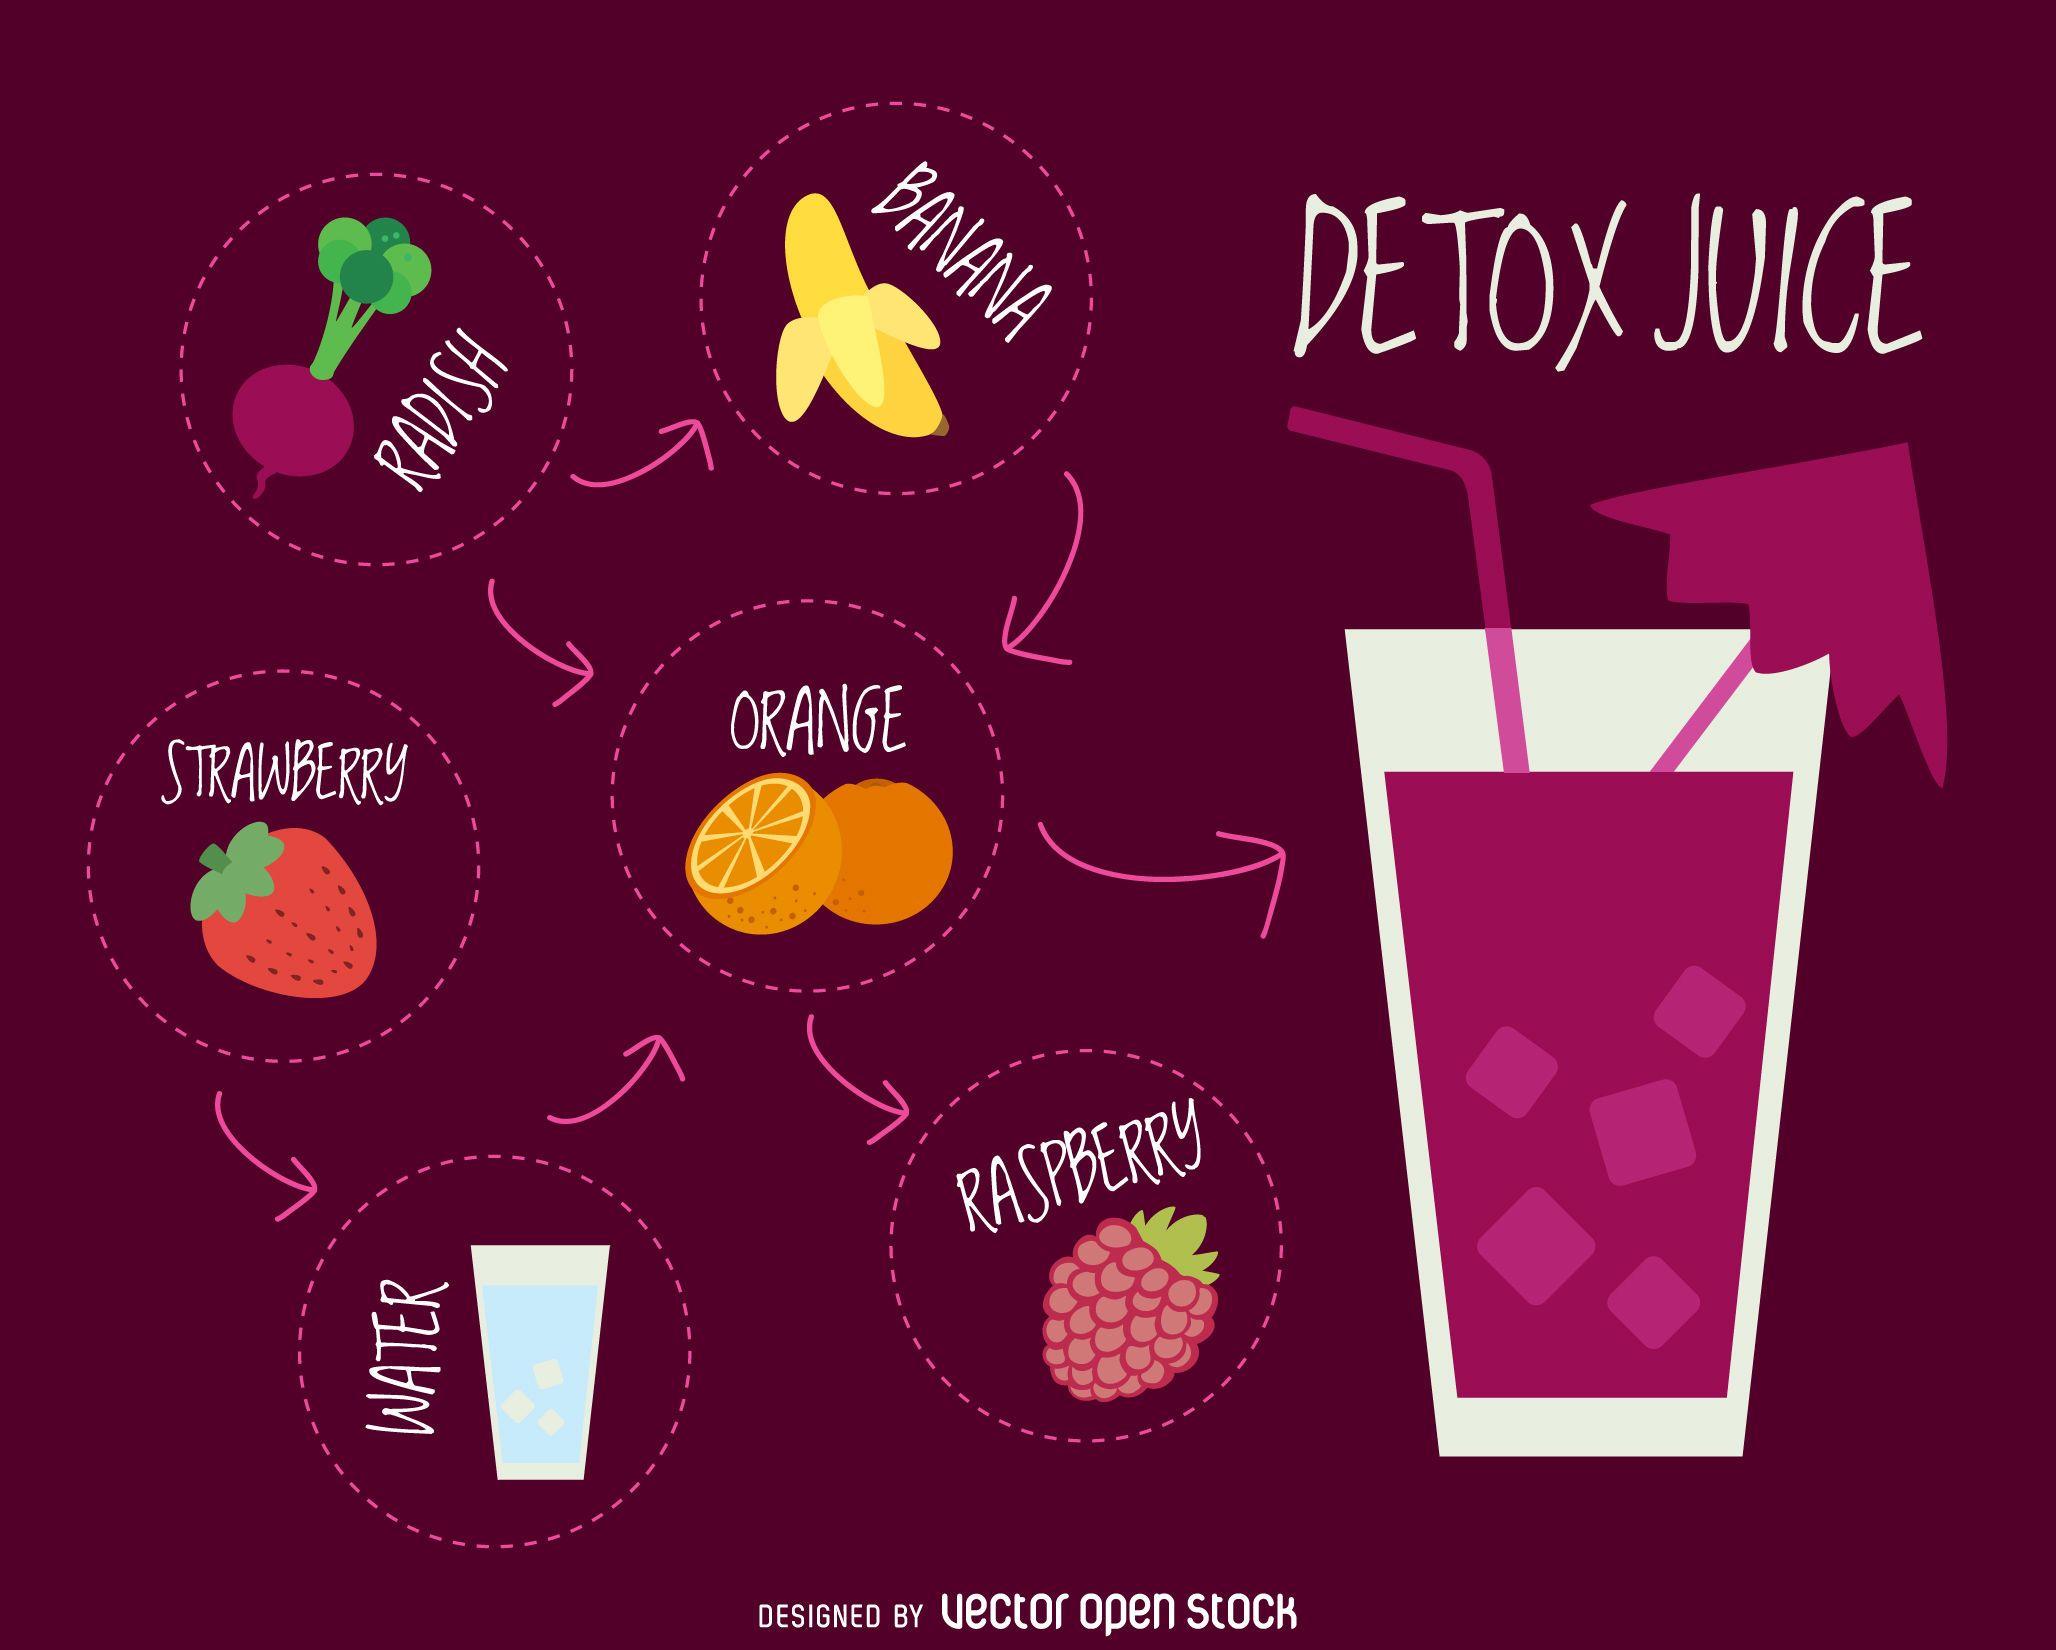 Purple Detox Juice with ingredients